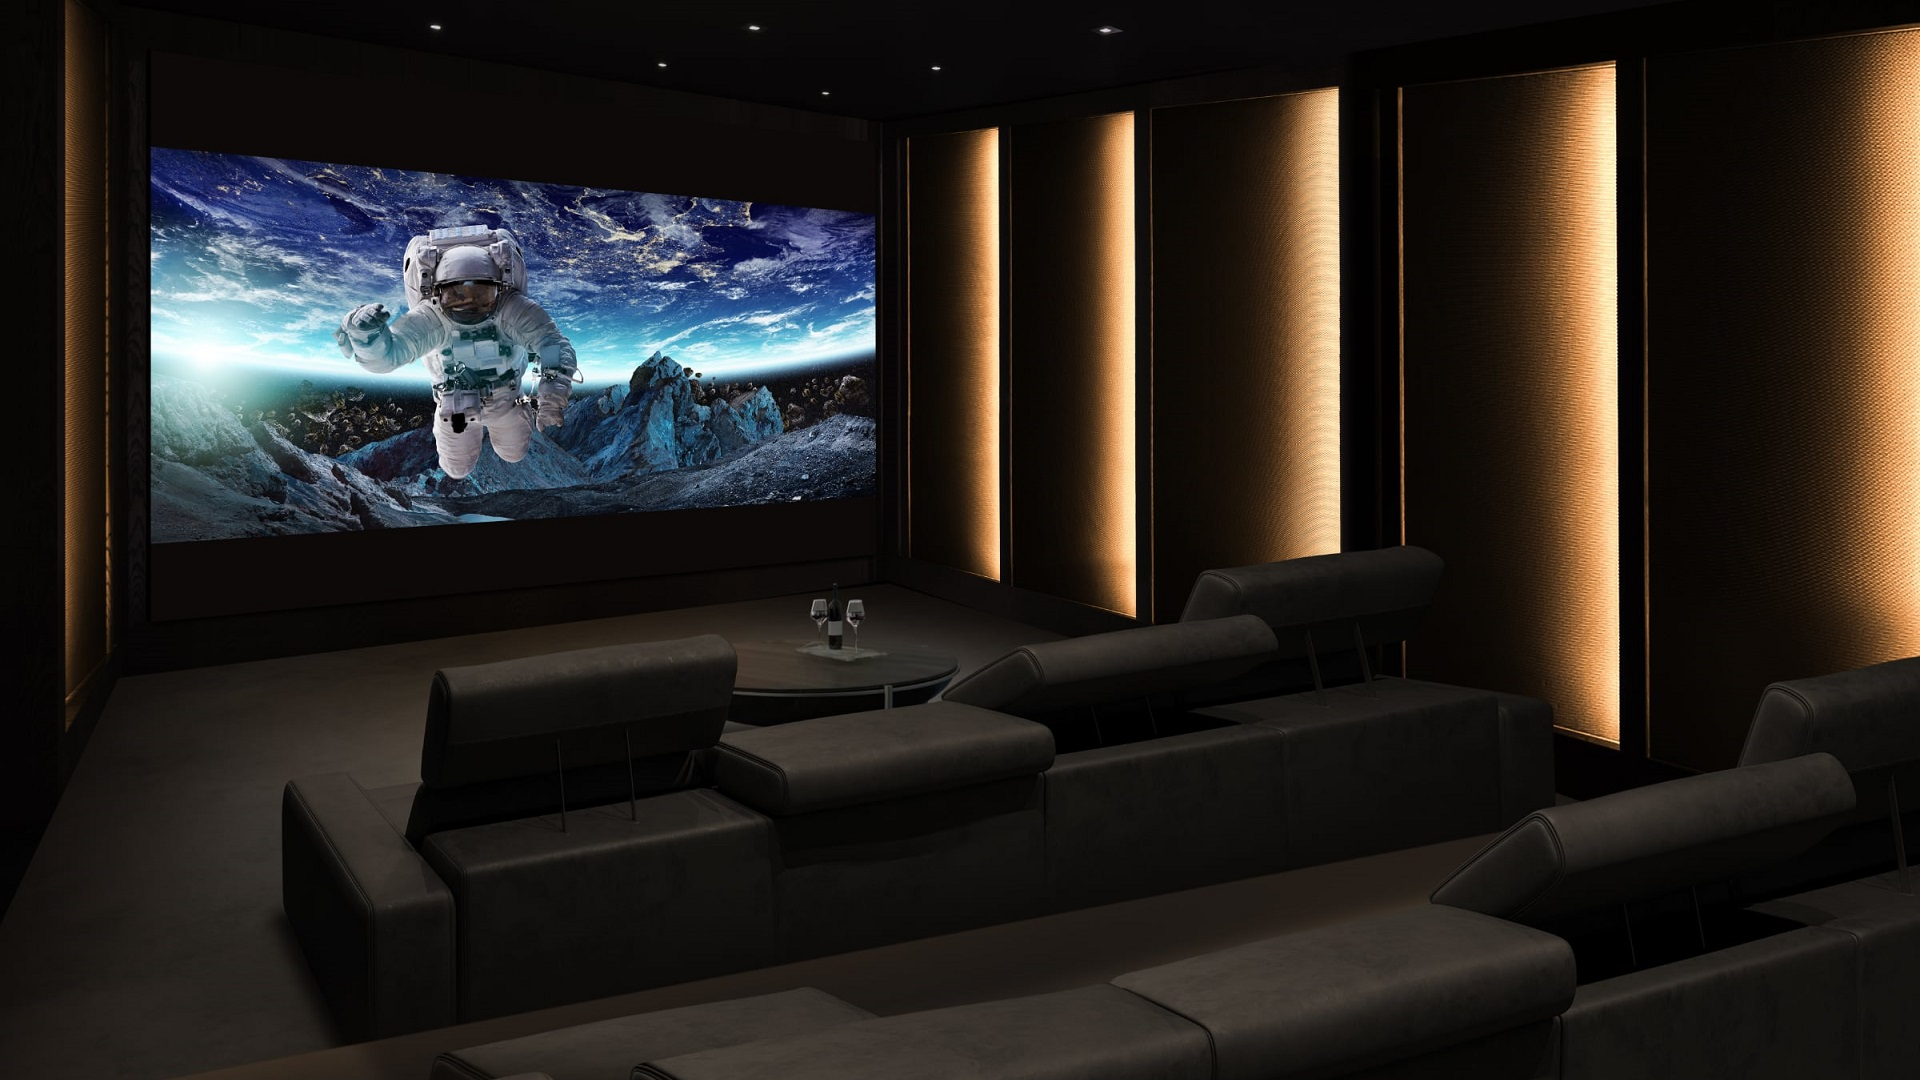 DVLED Extreme Home Cinema-házimozi